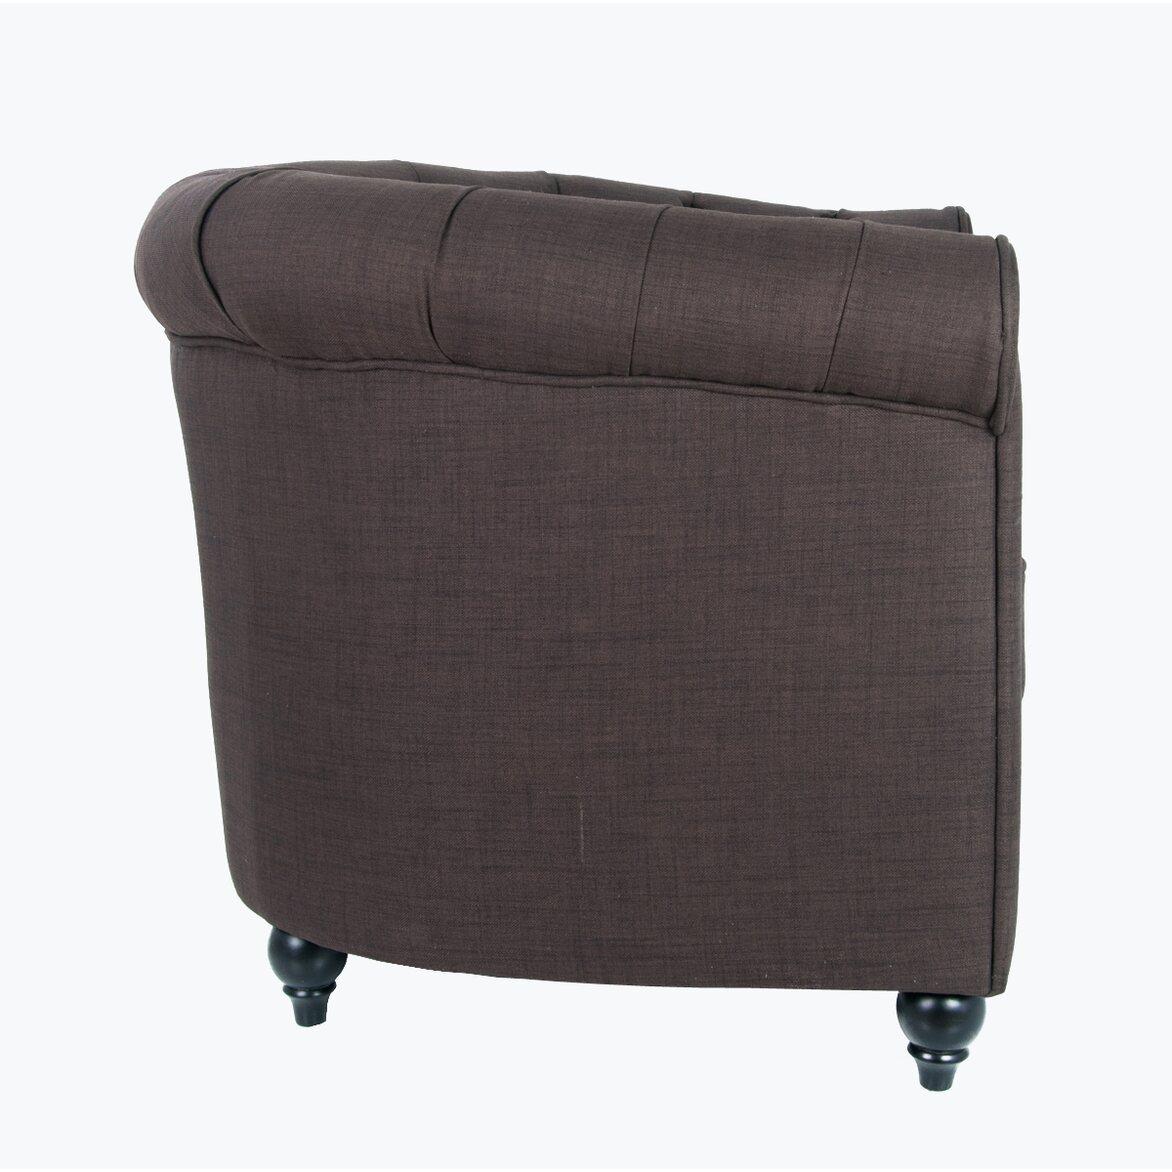 Кресло Nala brown 2 | Каминные кресла Kingsby